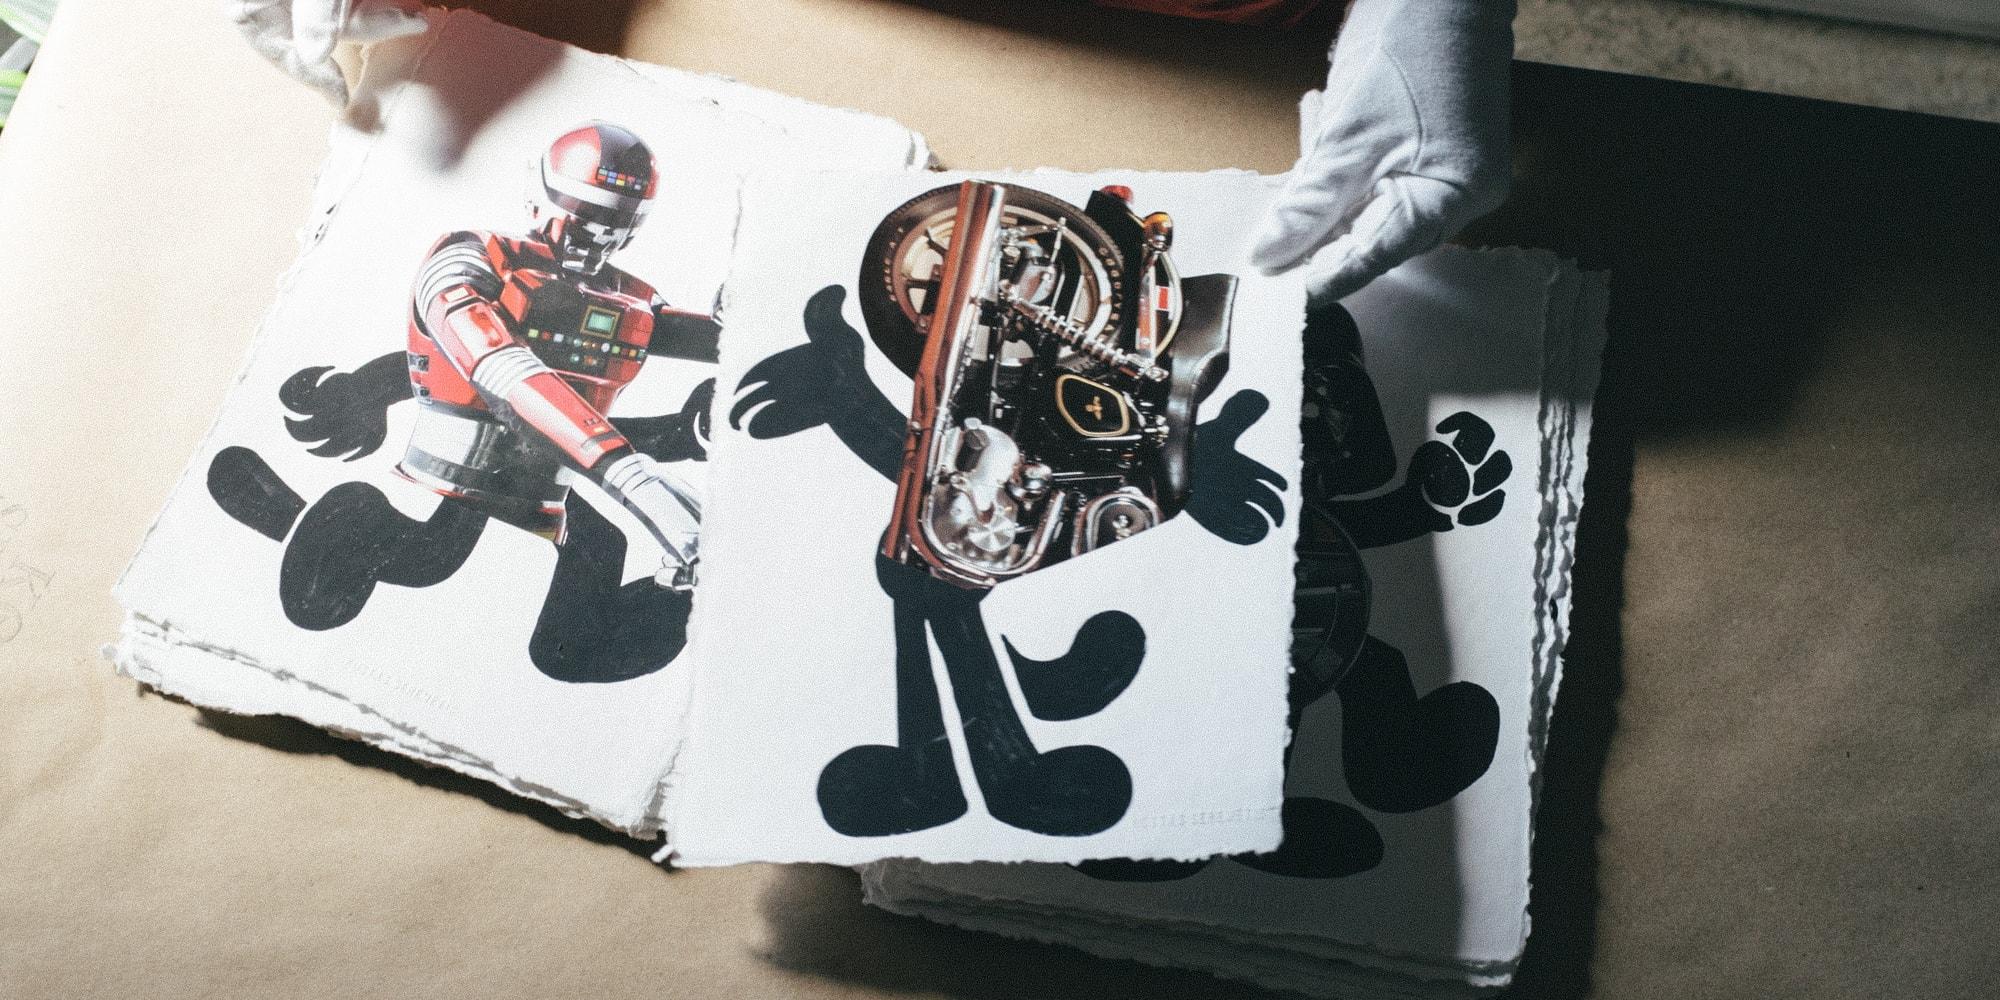 kostas seremetis studio visits feature hypeart hbx life prints collaboration artworks originals contemporary art